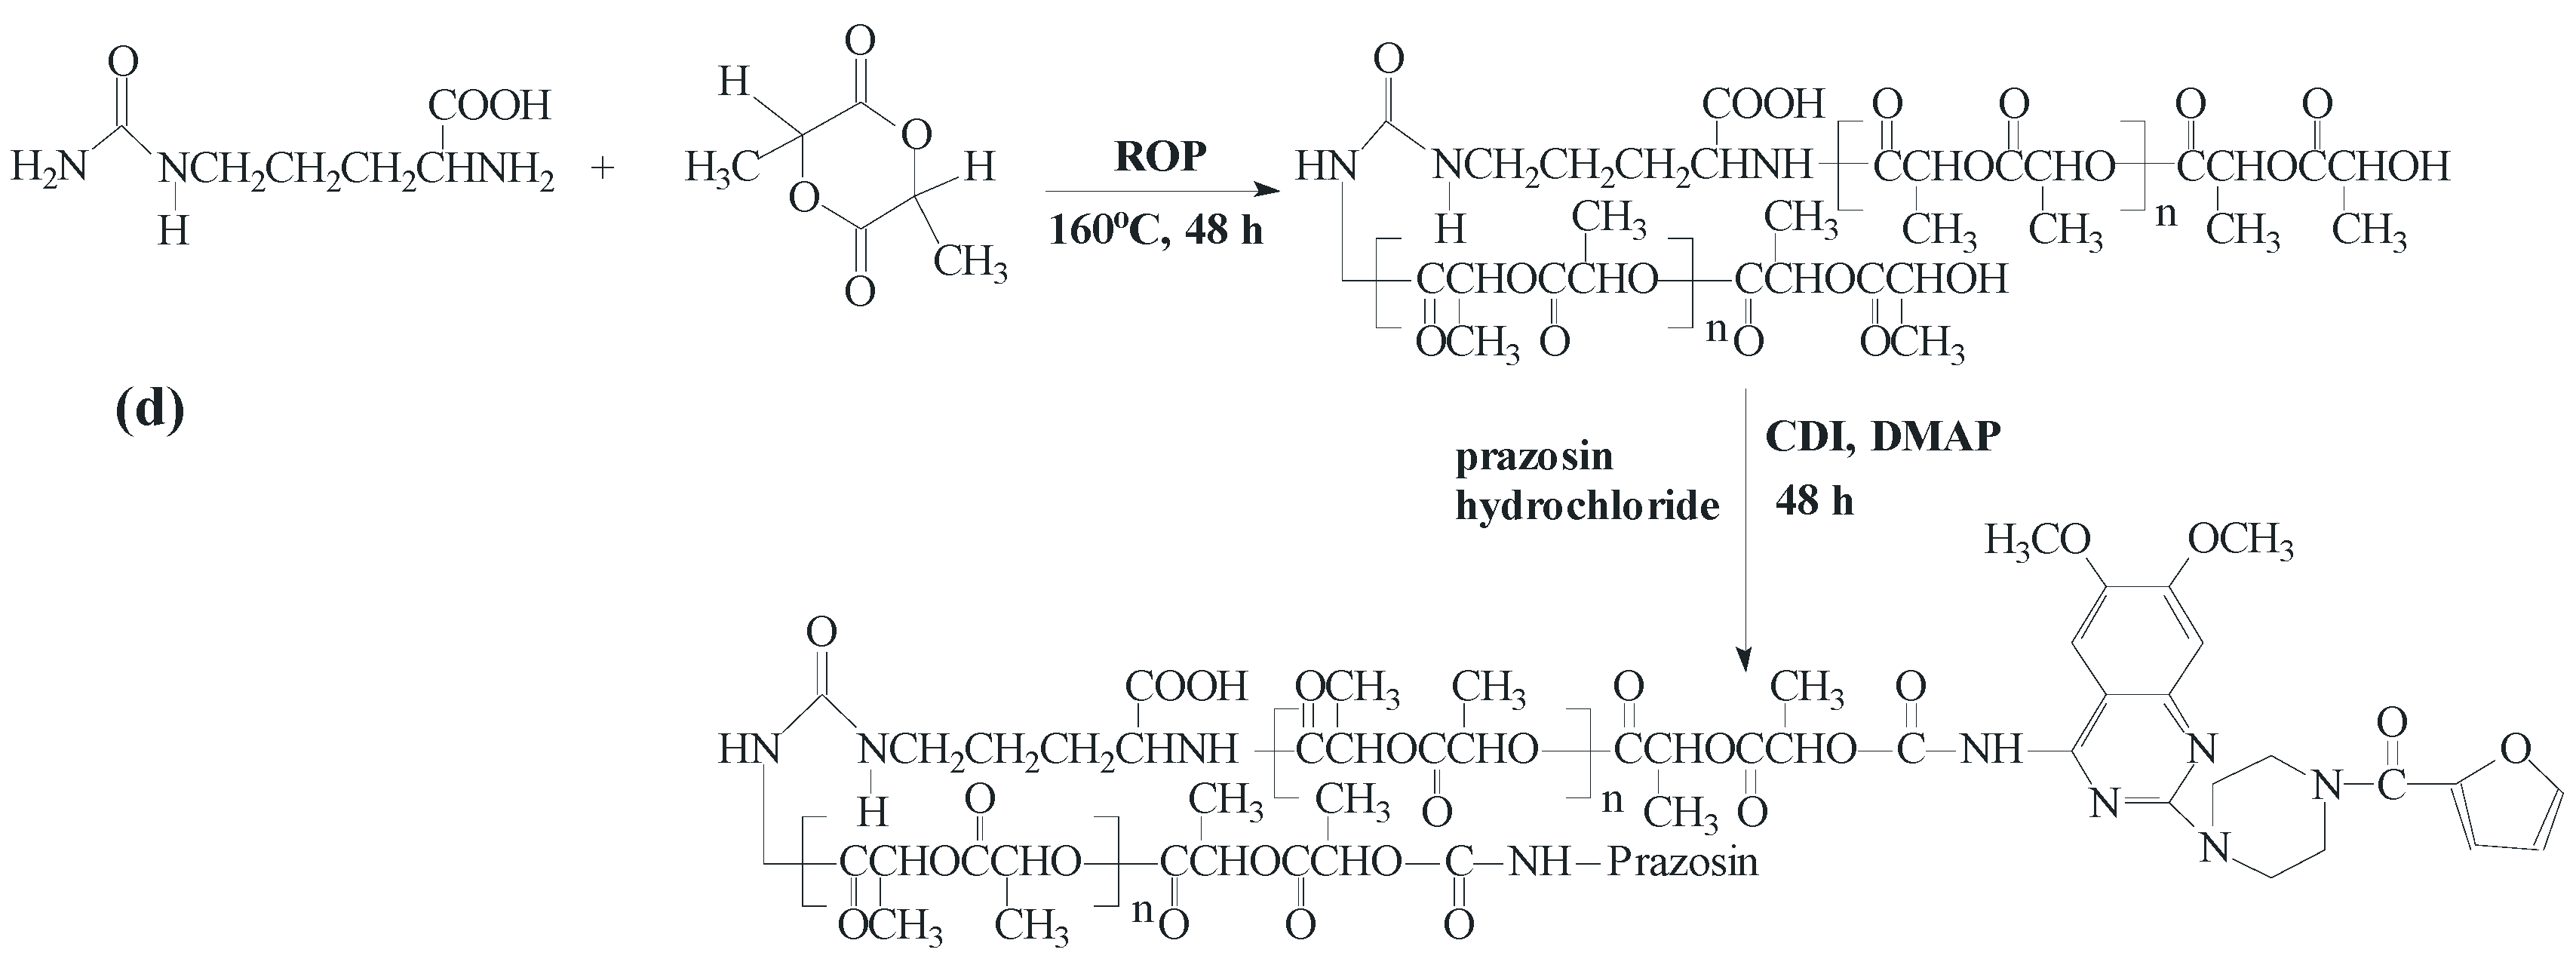 ciprofloxacin aristo 250 mg beipackzettel